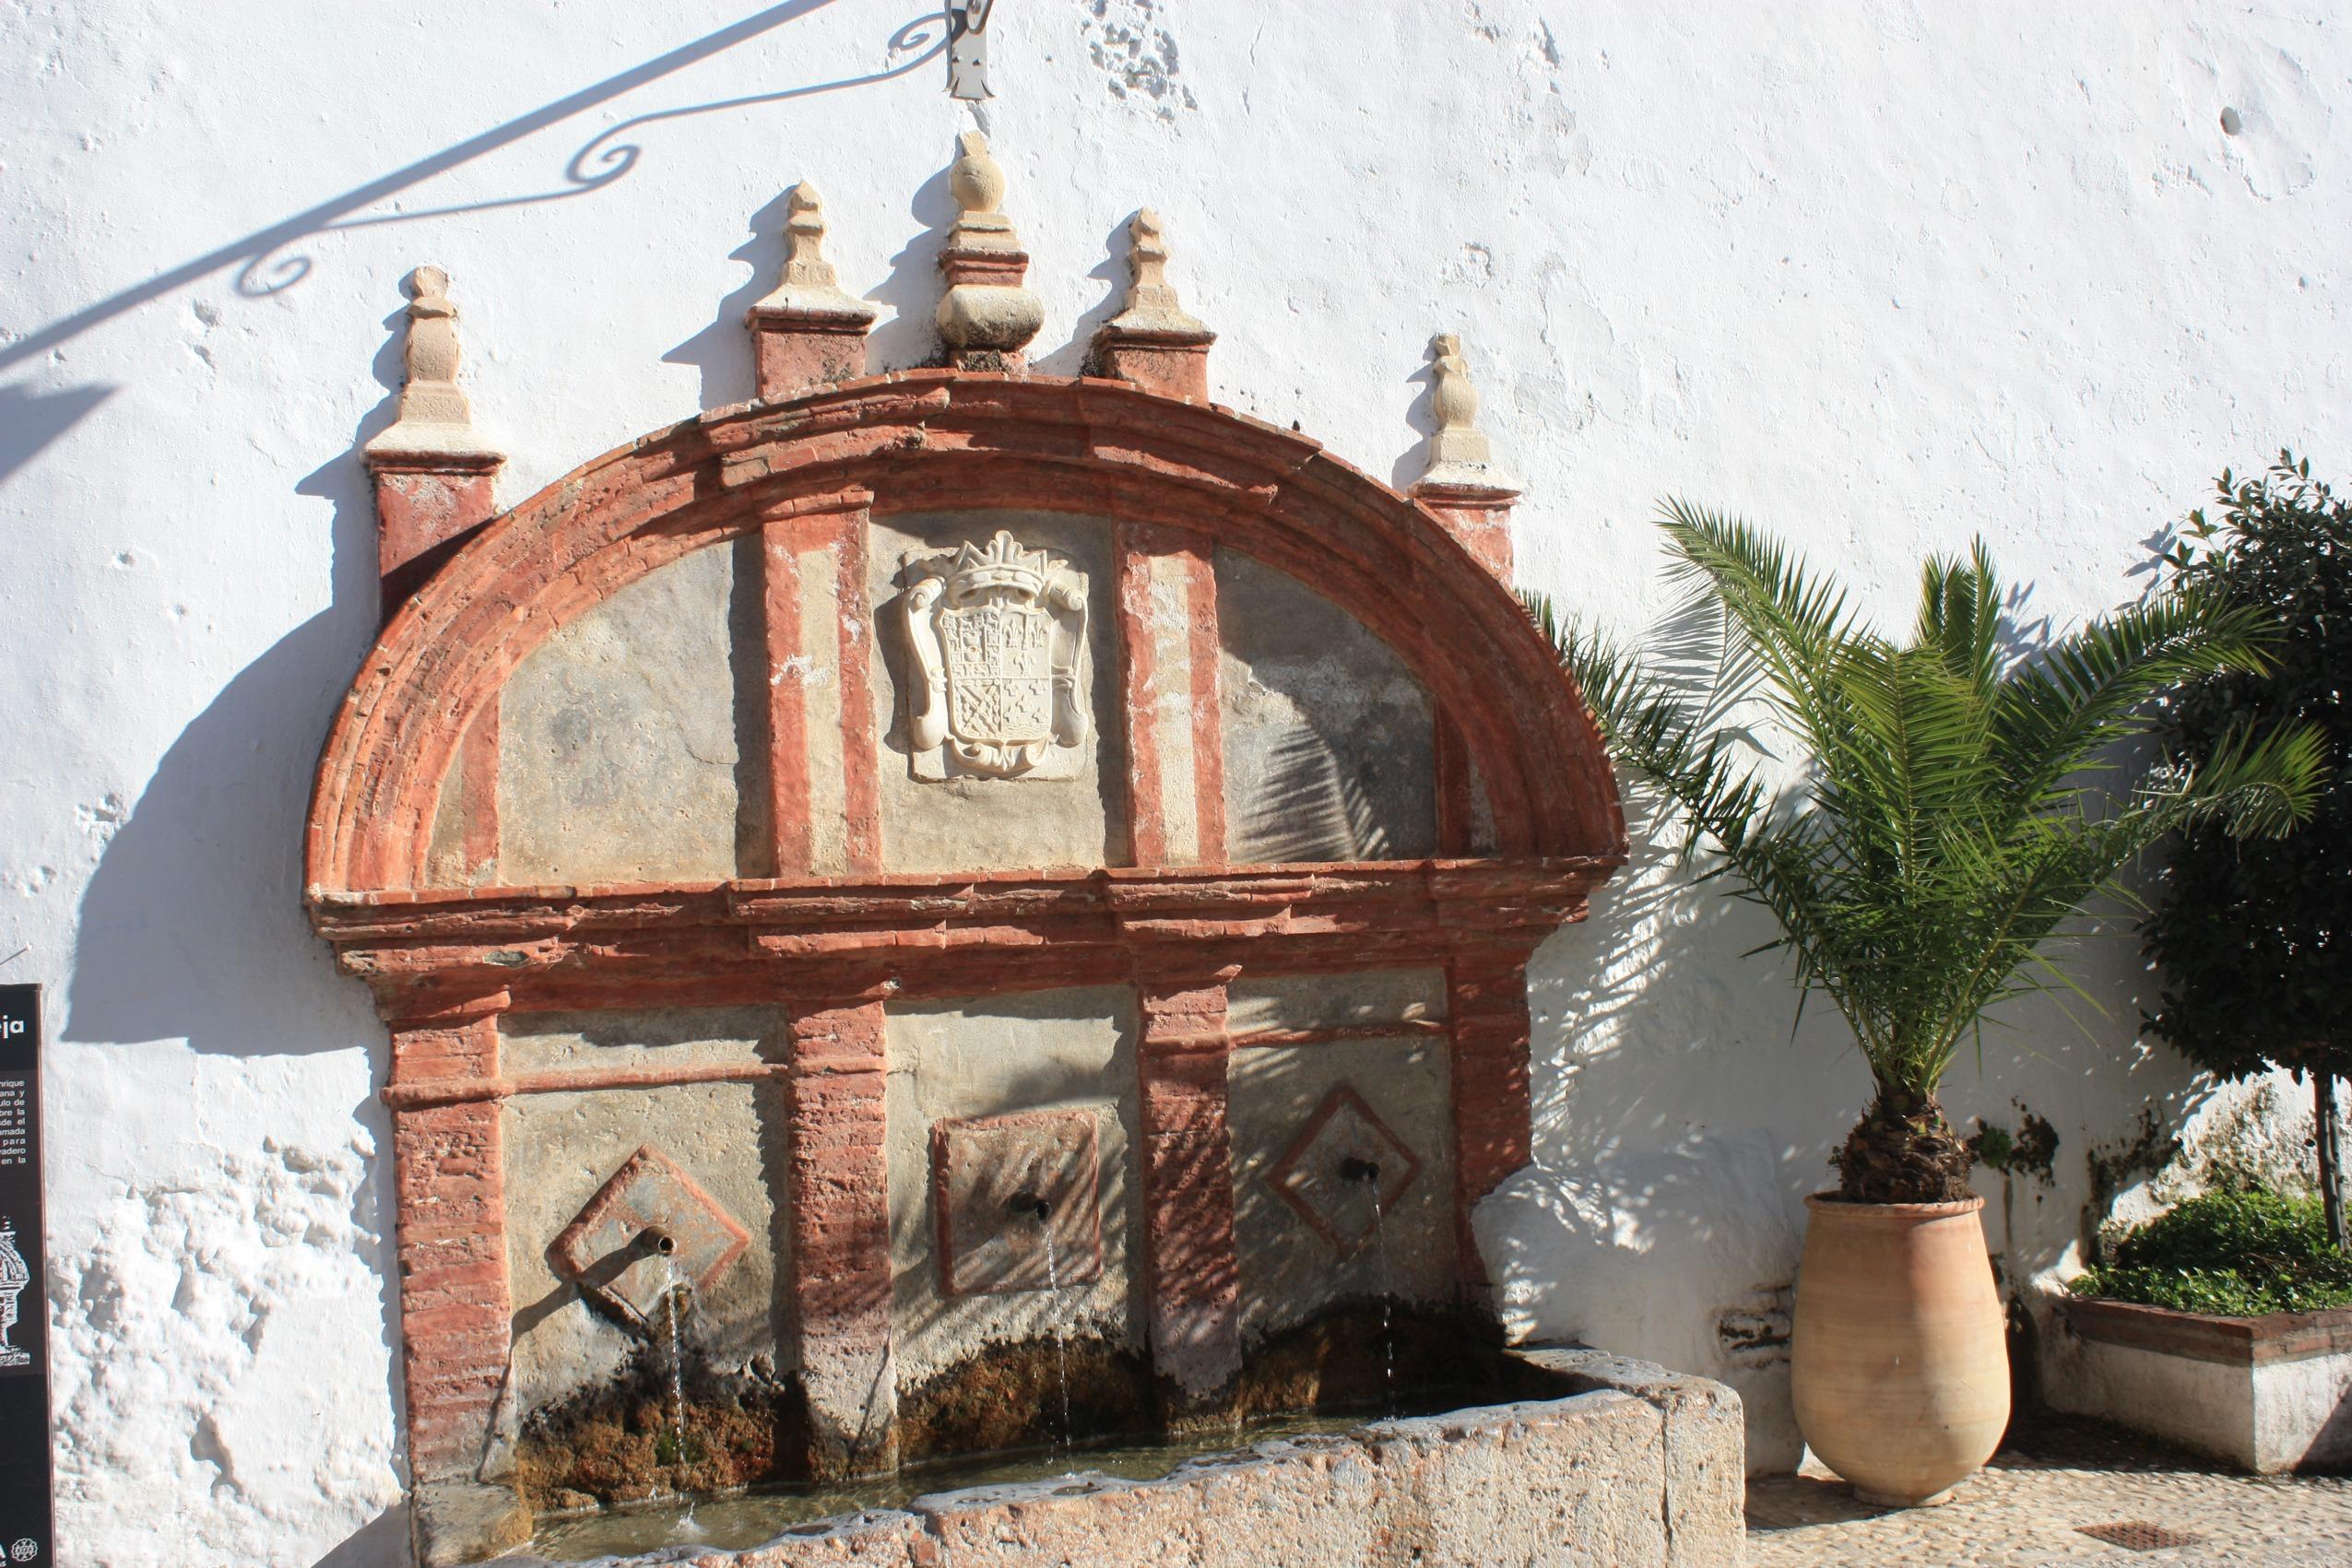 Old fountain in Frigiliana